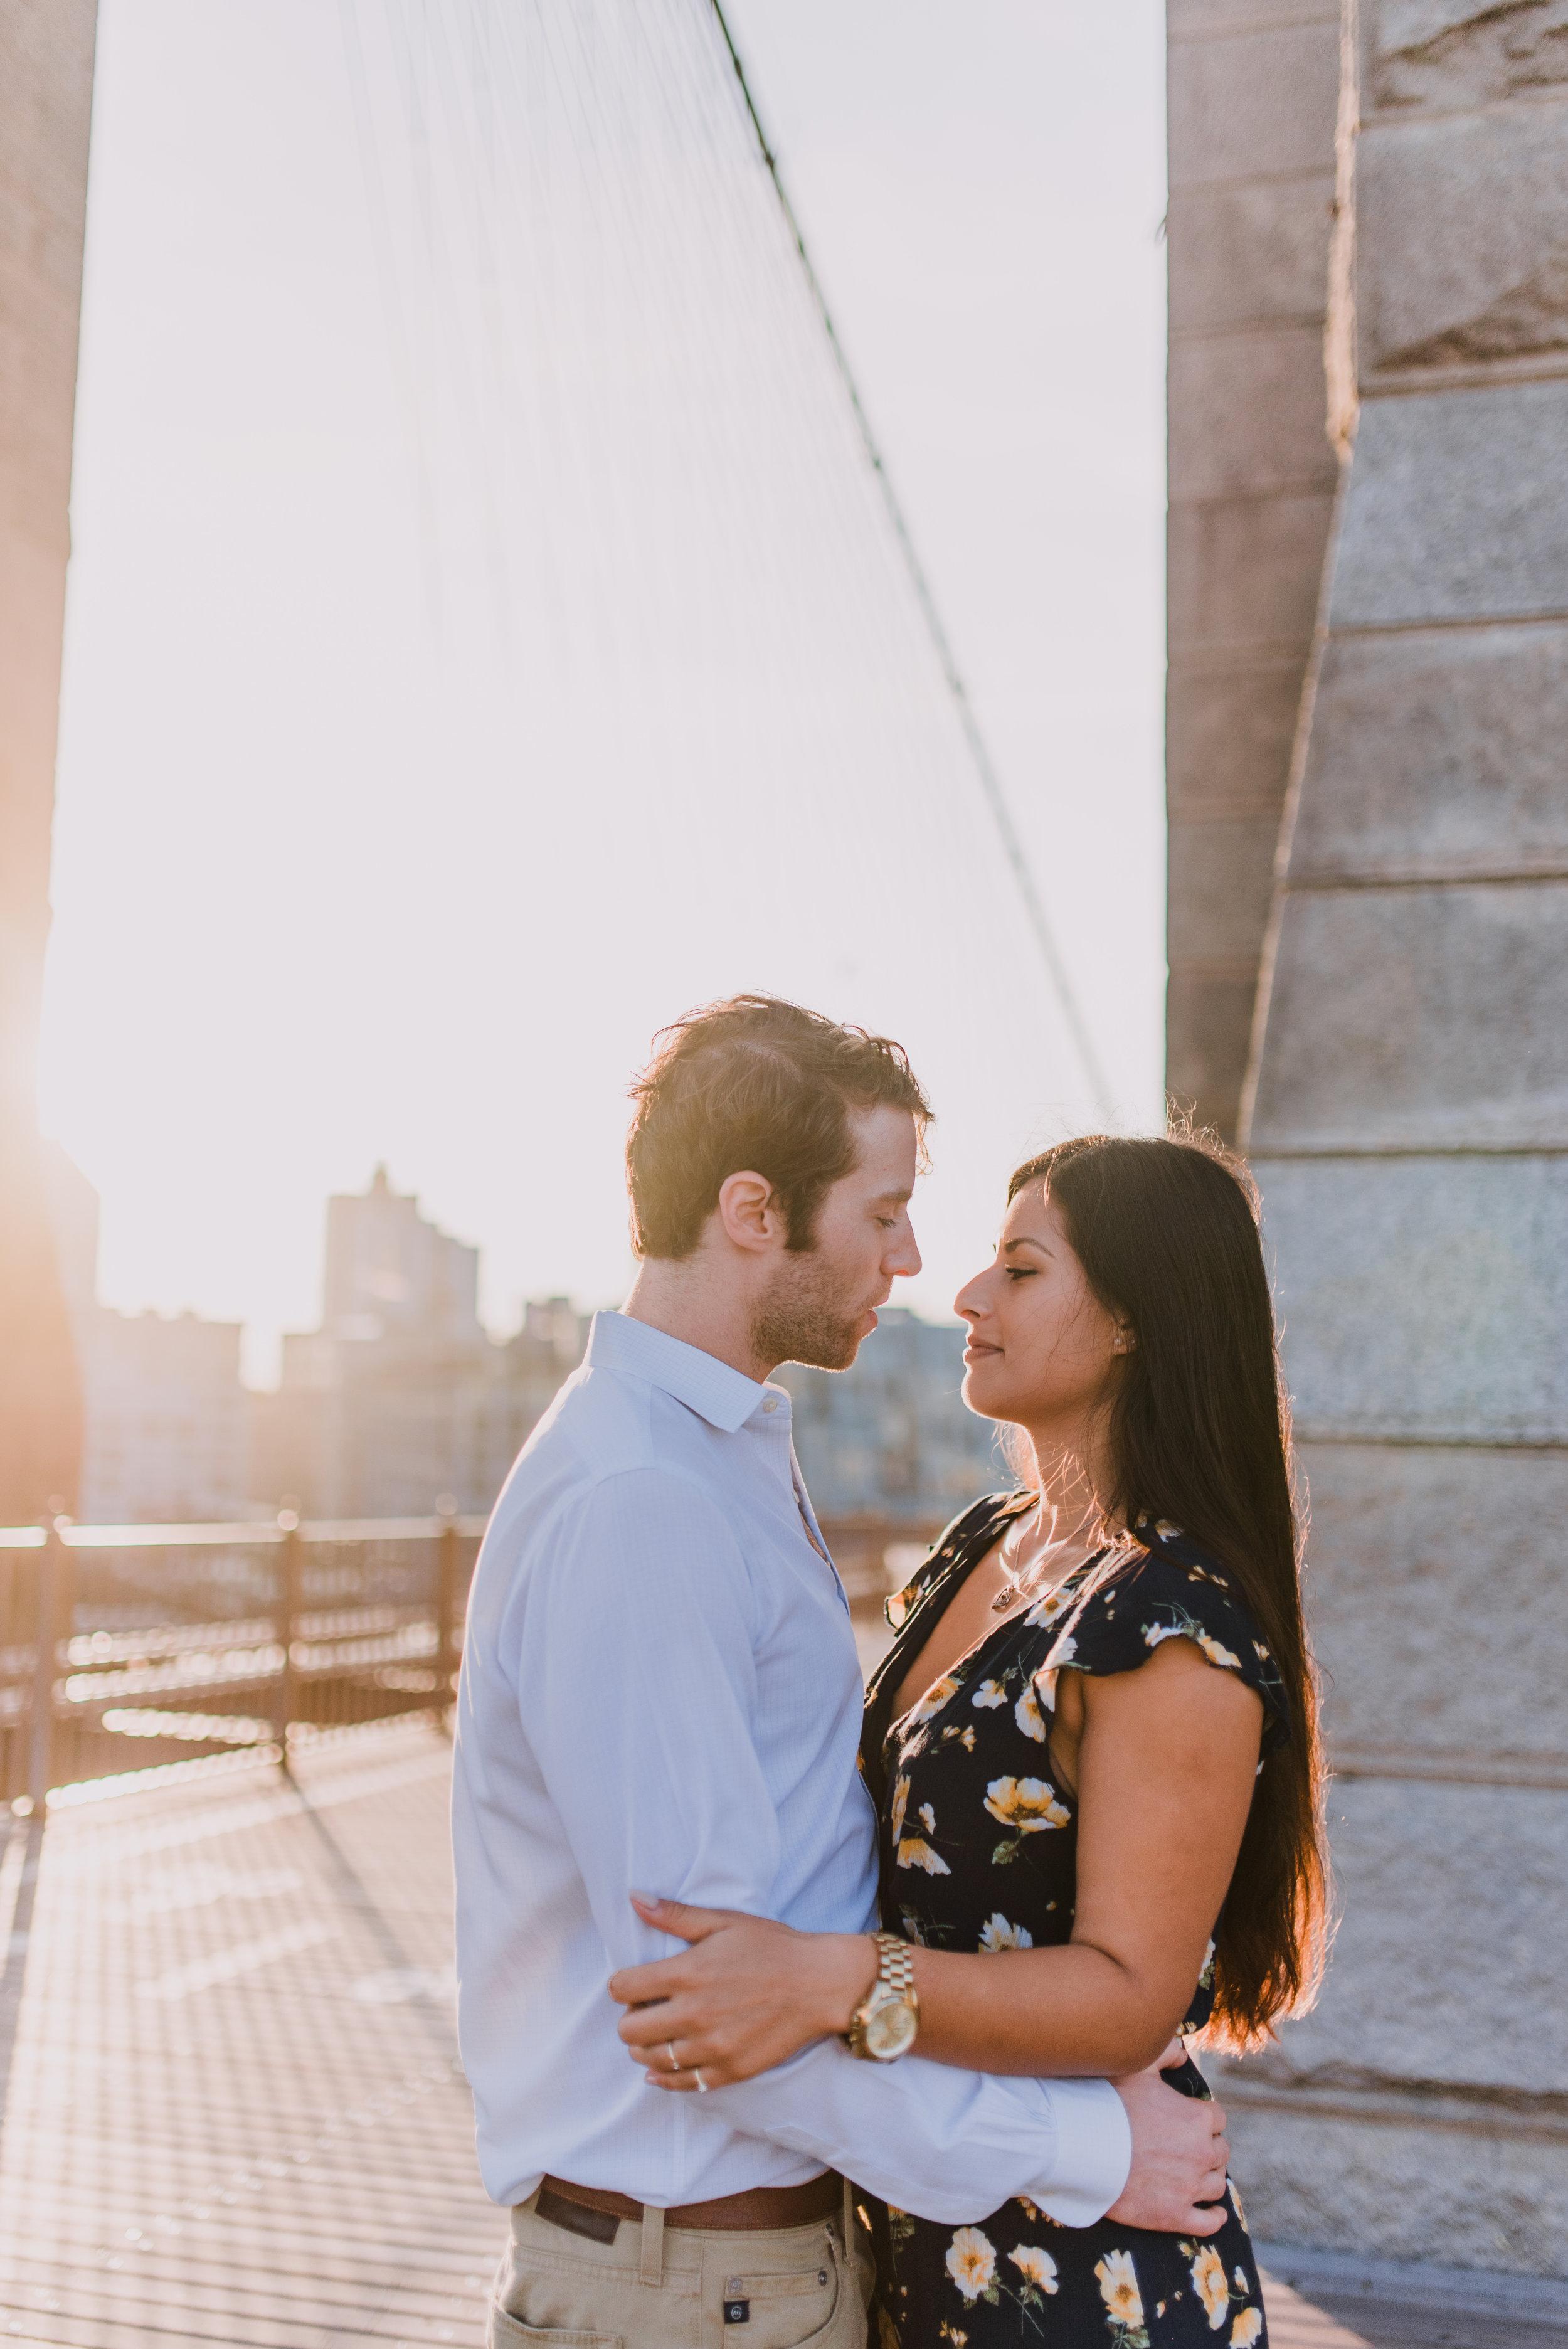 brooklyn bridge engagement shoot, couple shoot nyc, nyc wedding photographer, destination wedding photographer, documentary wedding photographer in nyc (11).jpg